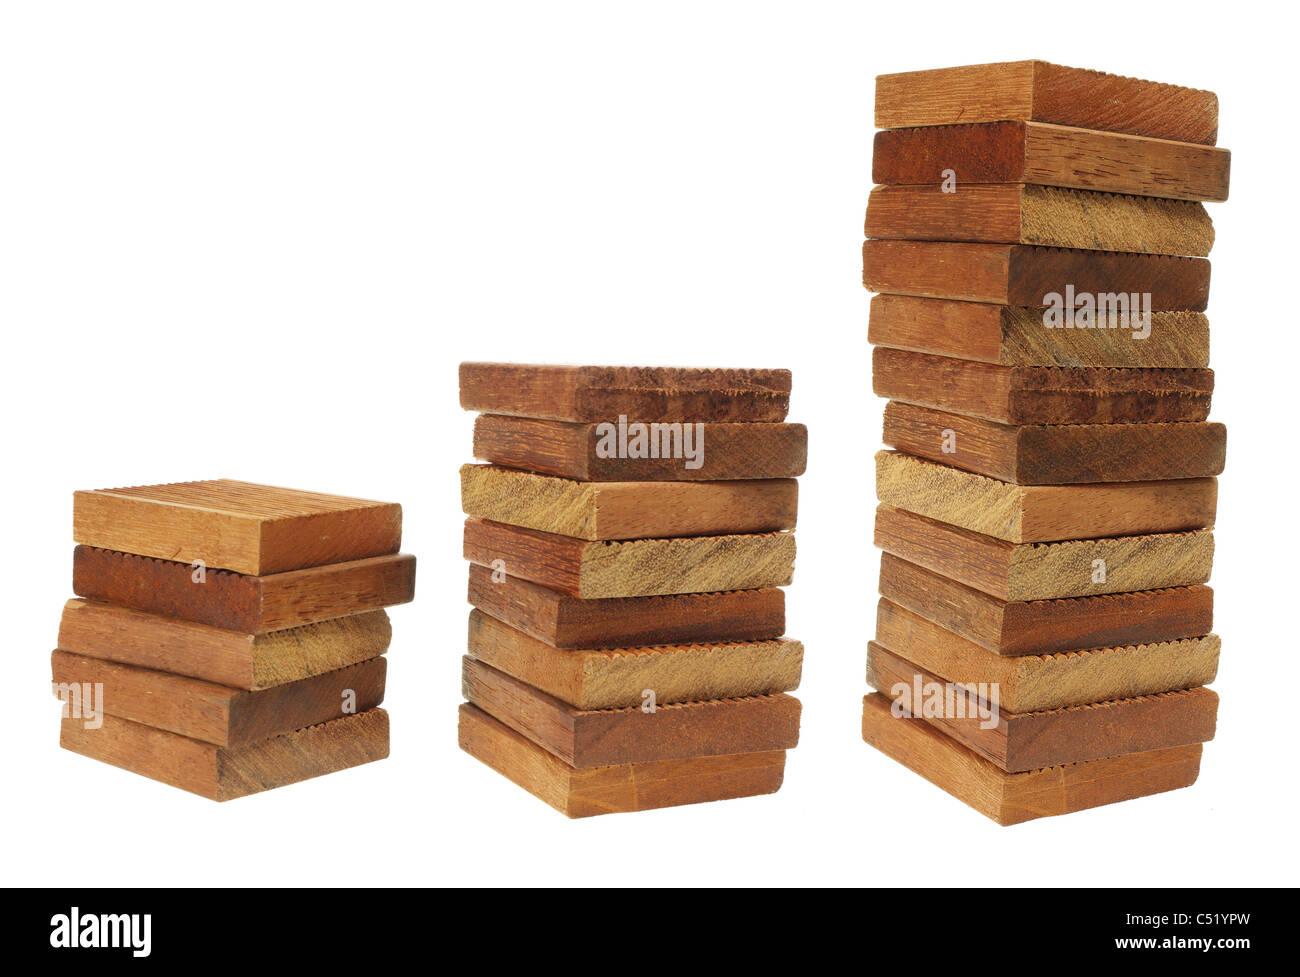 Stapel von Holzklötzen Stockbild